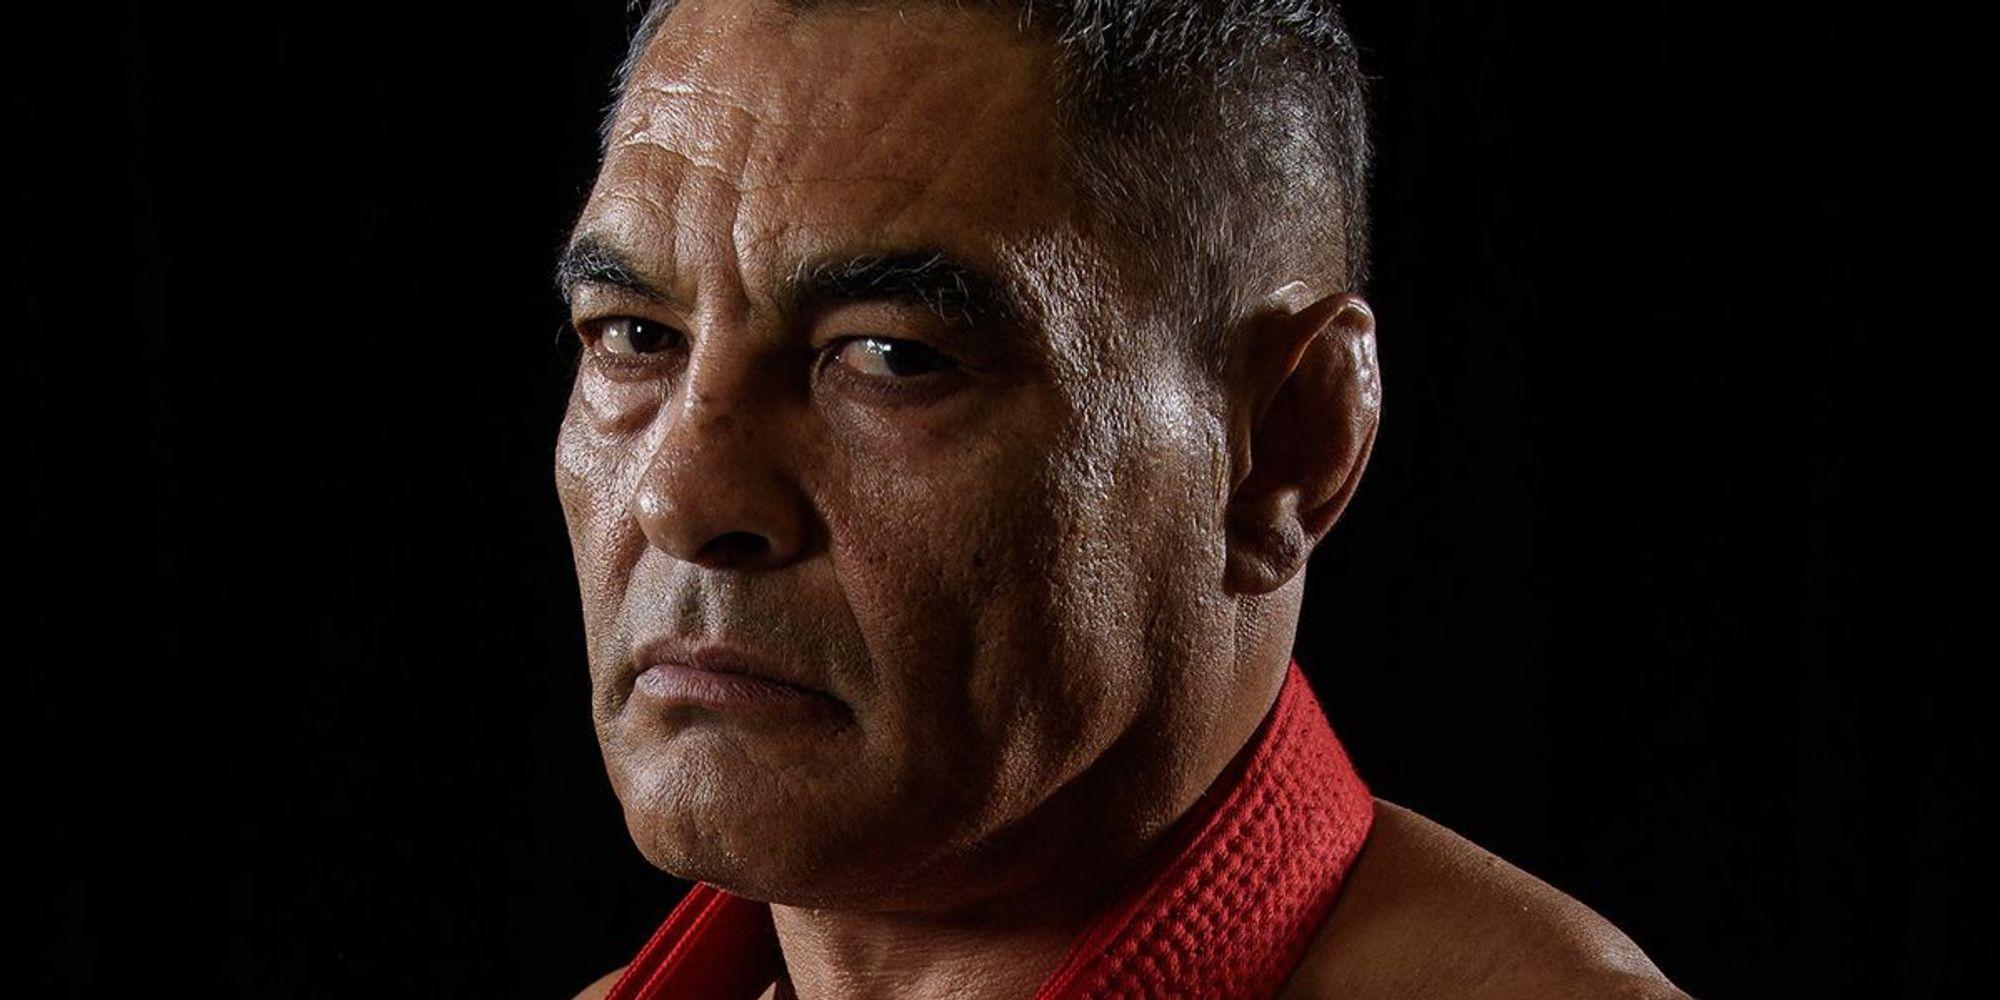 Rickson Gracie: Classic Q&A With the Legend of Brazilian Jiu-Jitsu (Part 1)